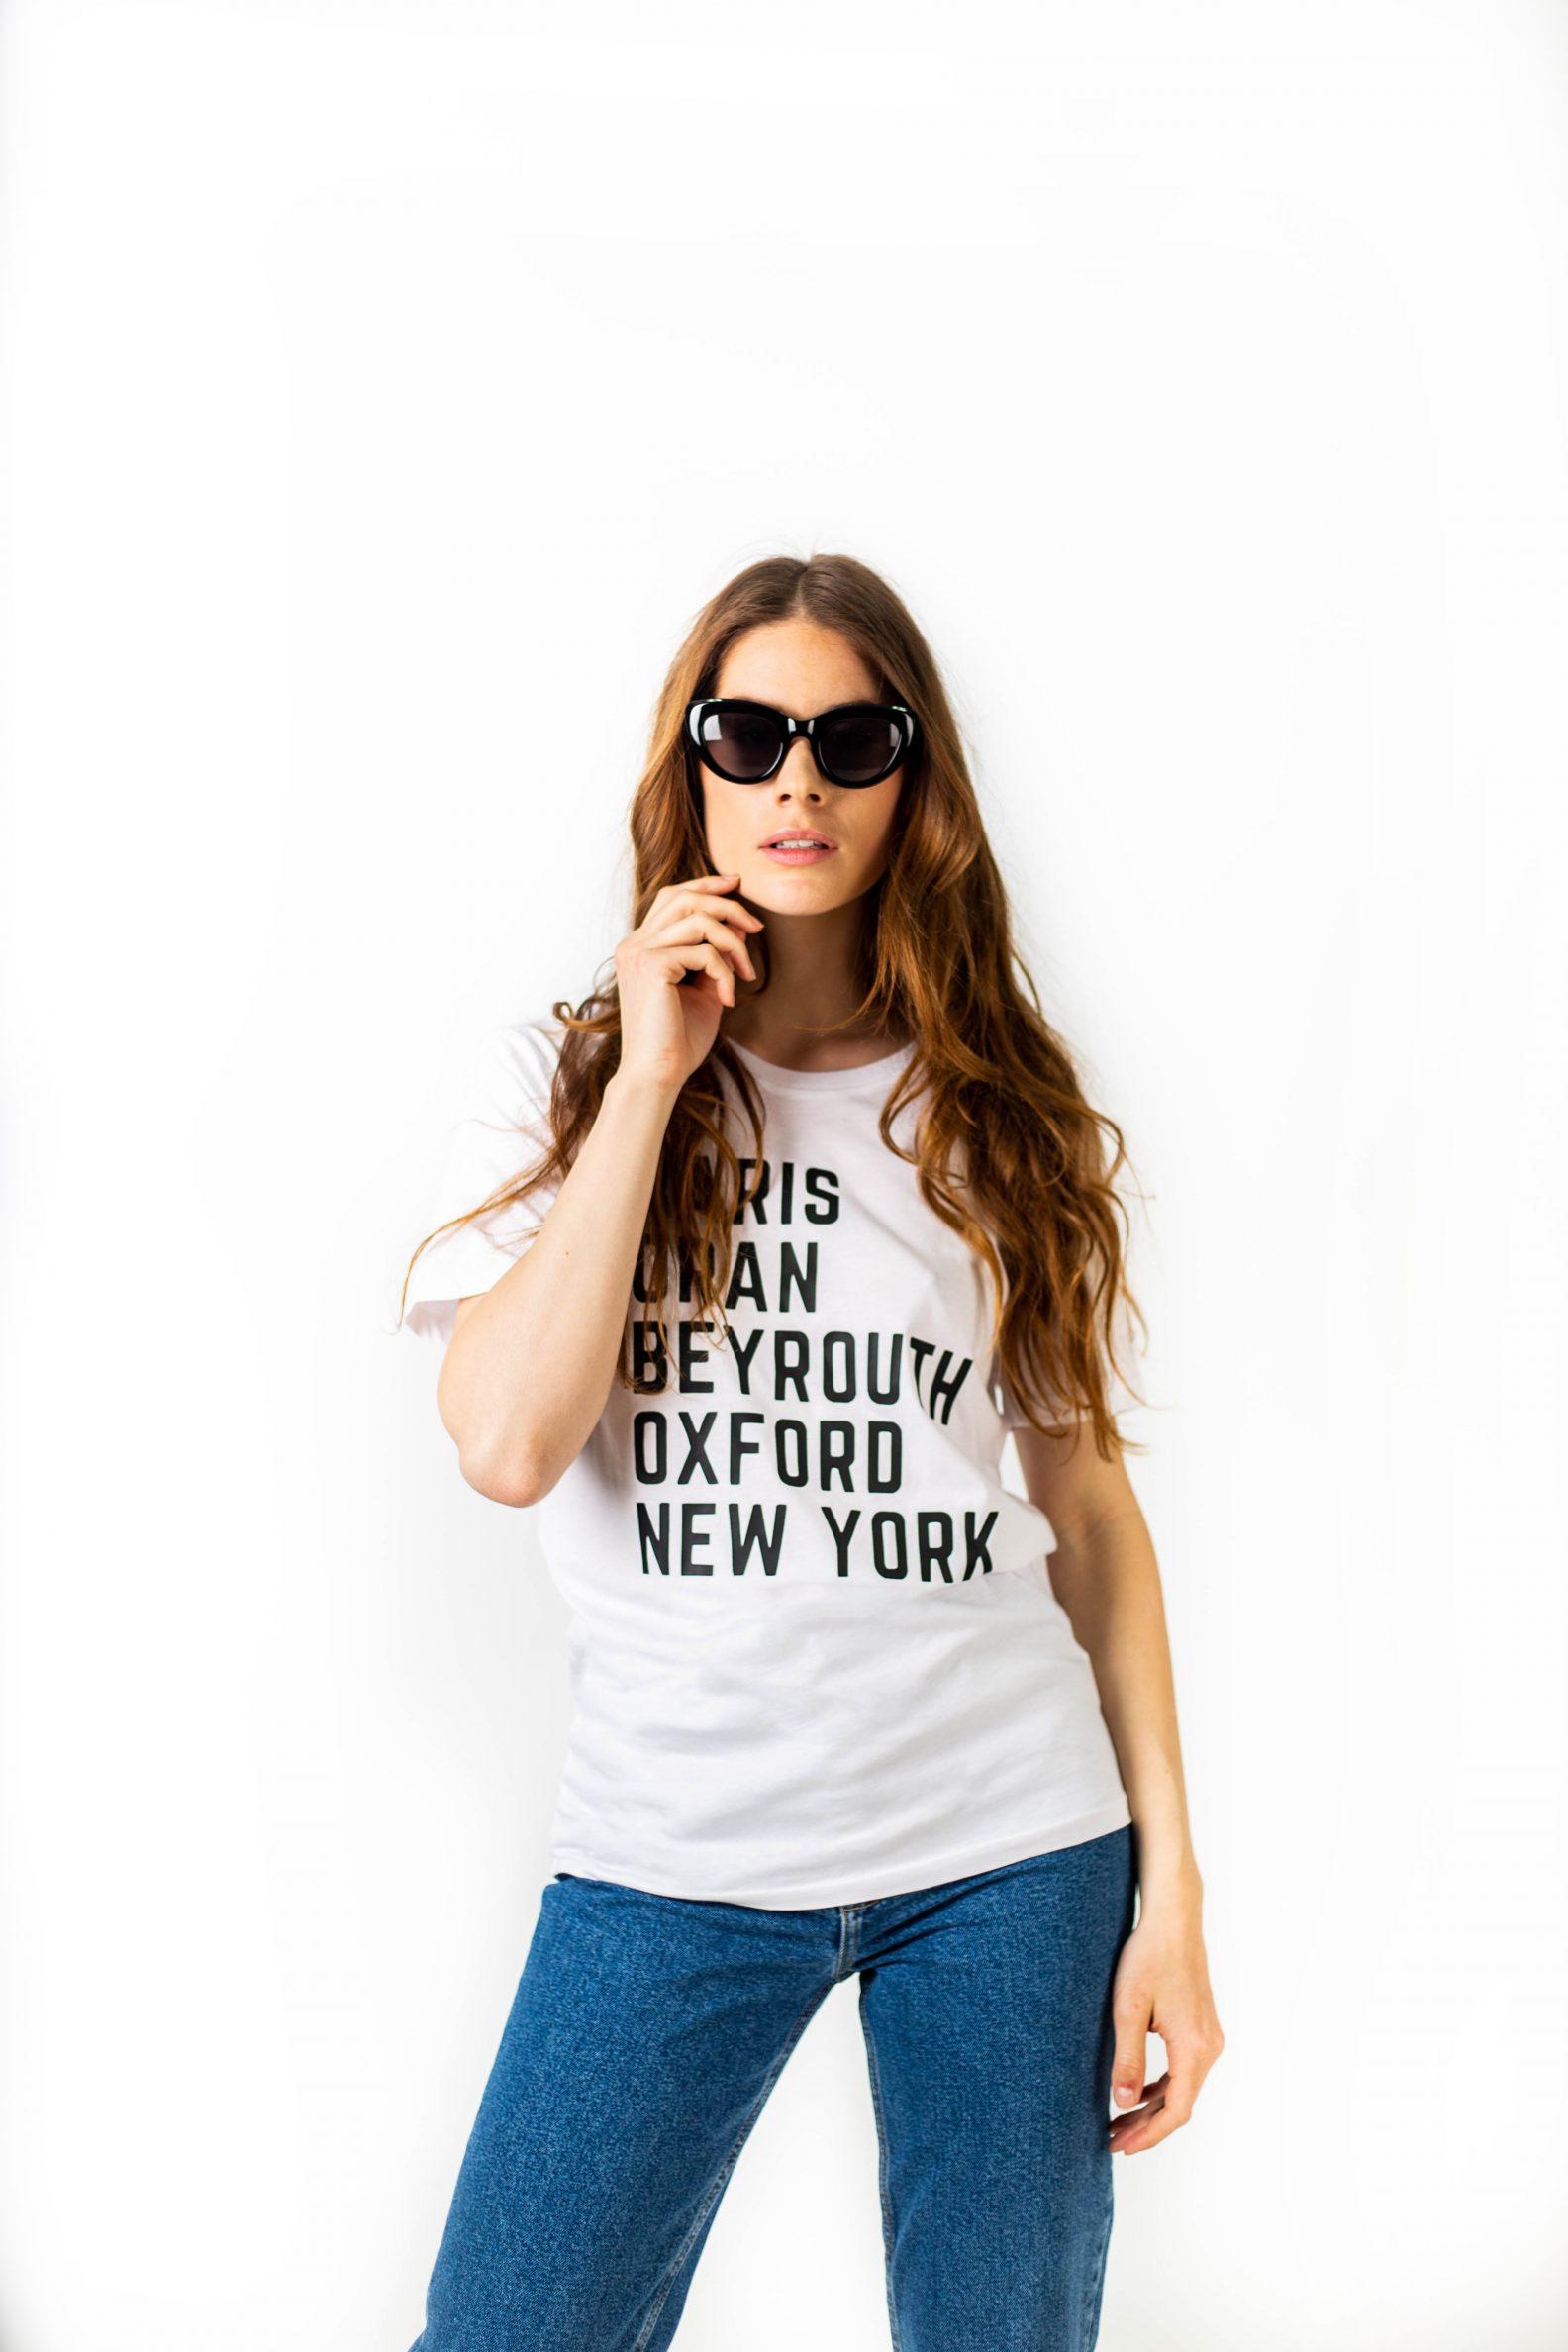 T-shirt Paris Oran ... New York-Paris Oran... t-shirt-1-tshirt-coton-bio-paris-oran-affaires-etrangeres-mode-ethnique-chic-ethique